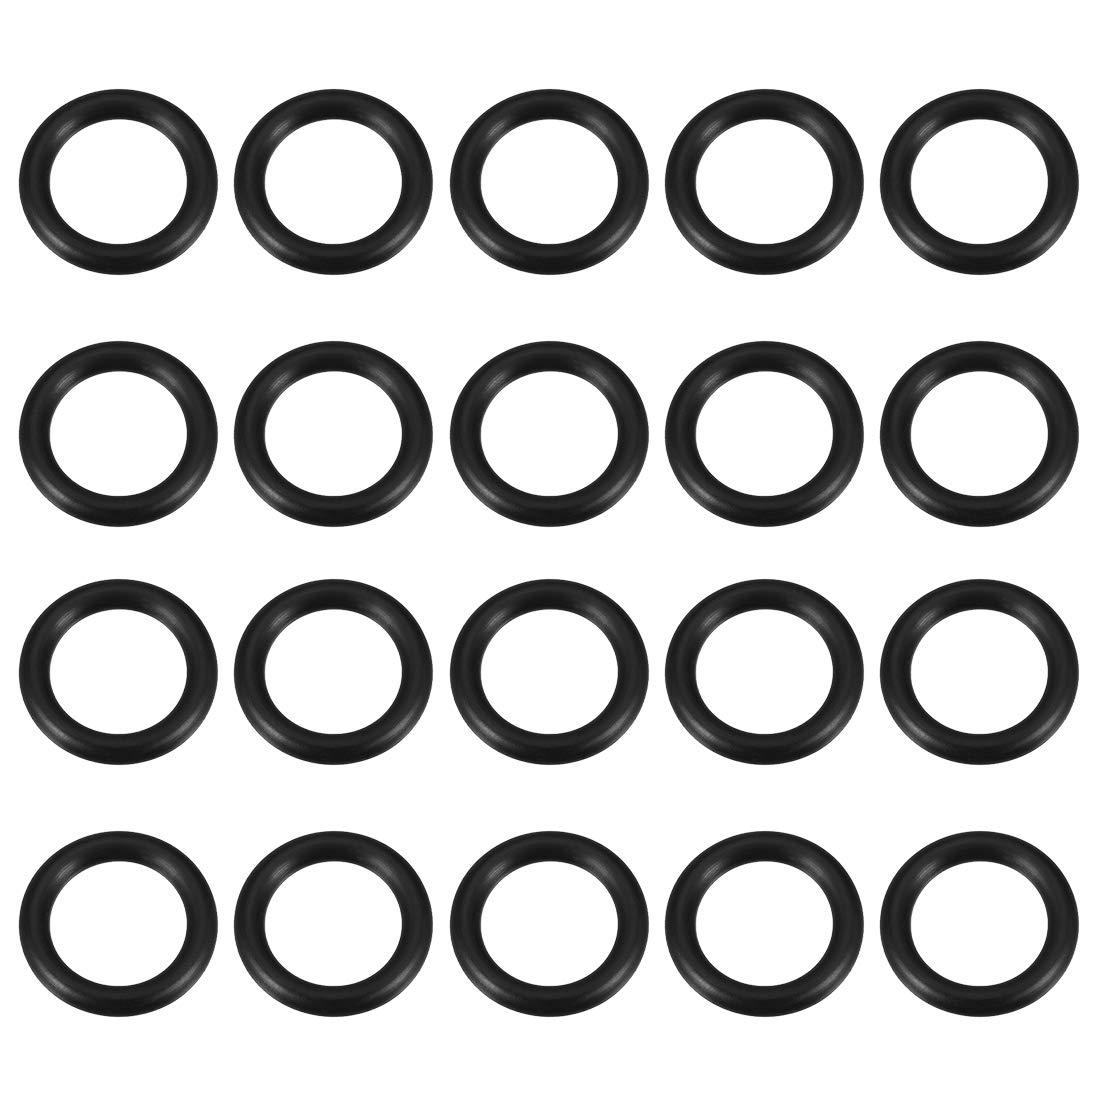 22mm Inner Diameter uxcell O-Rings Nitrile Rubber Gasket 29mm OD 20pcs 3.5mm Width